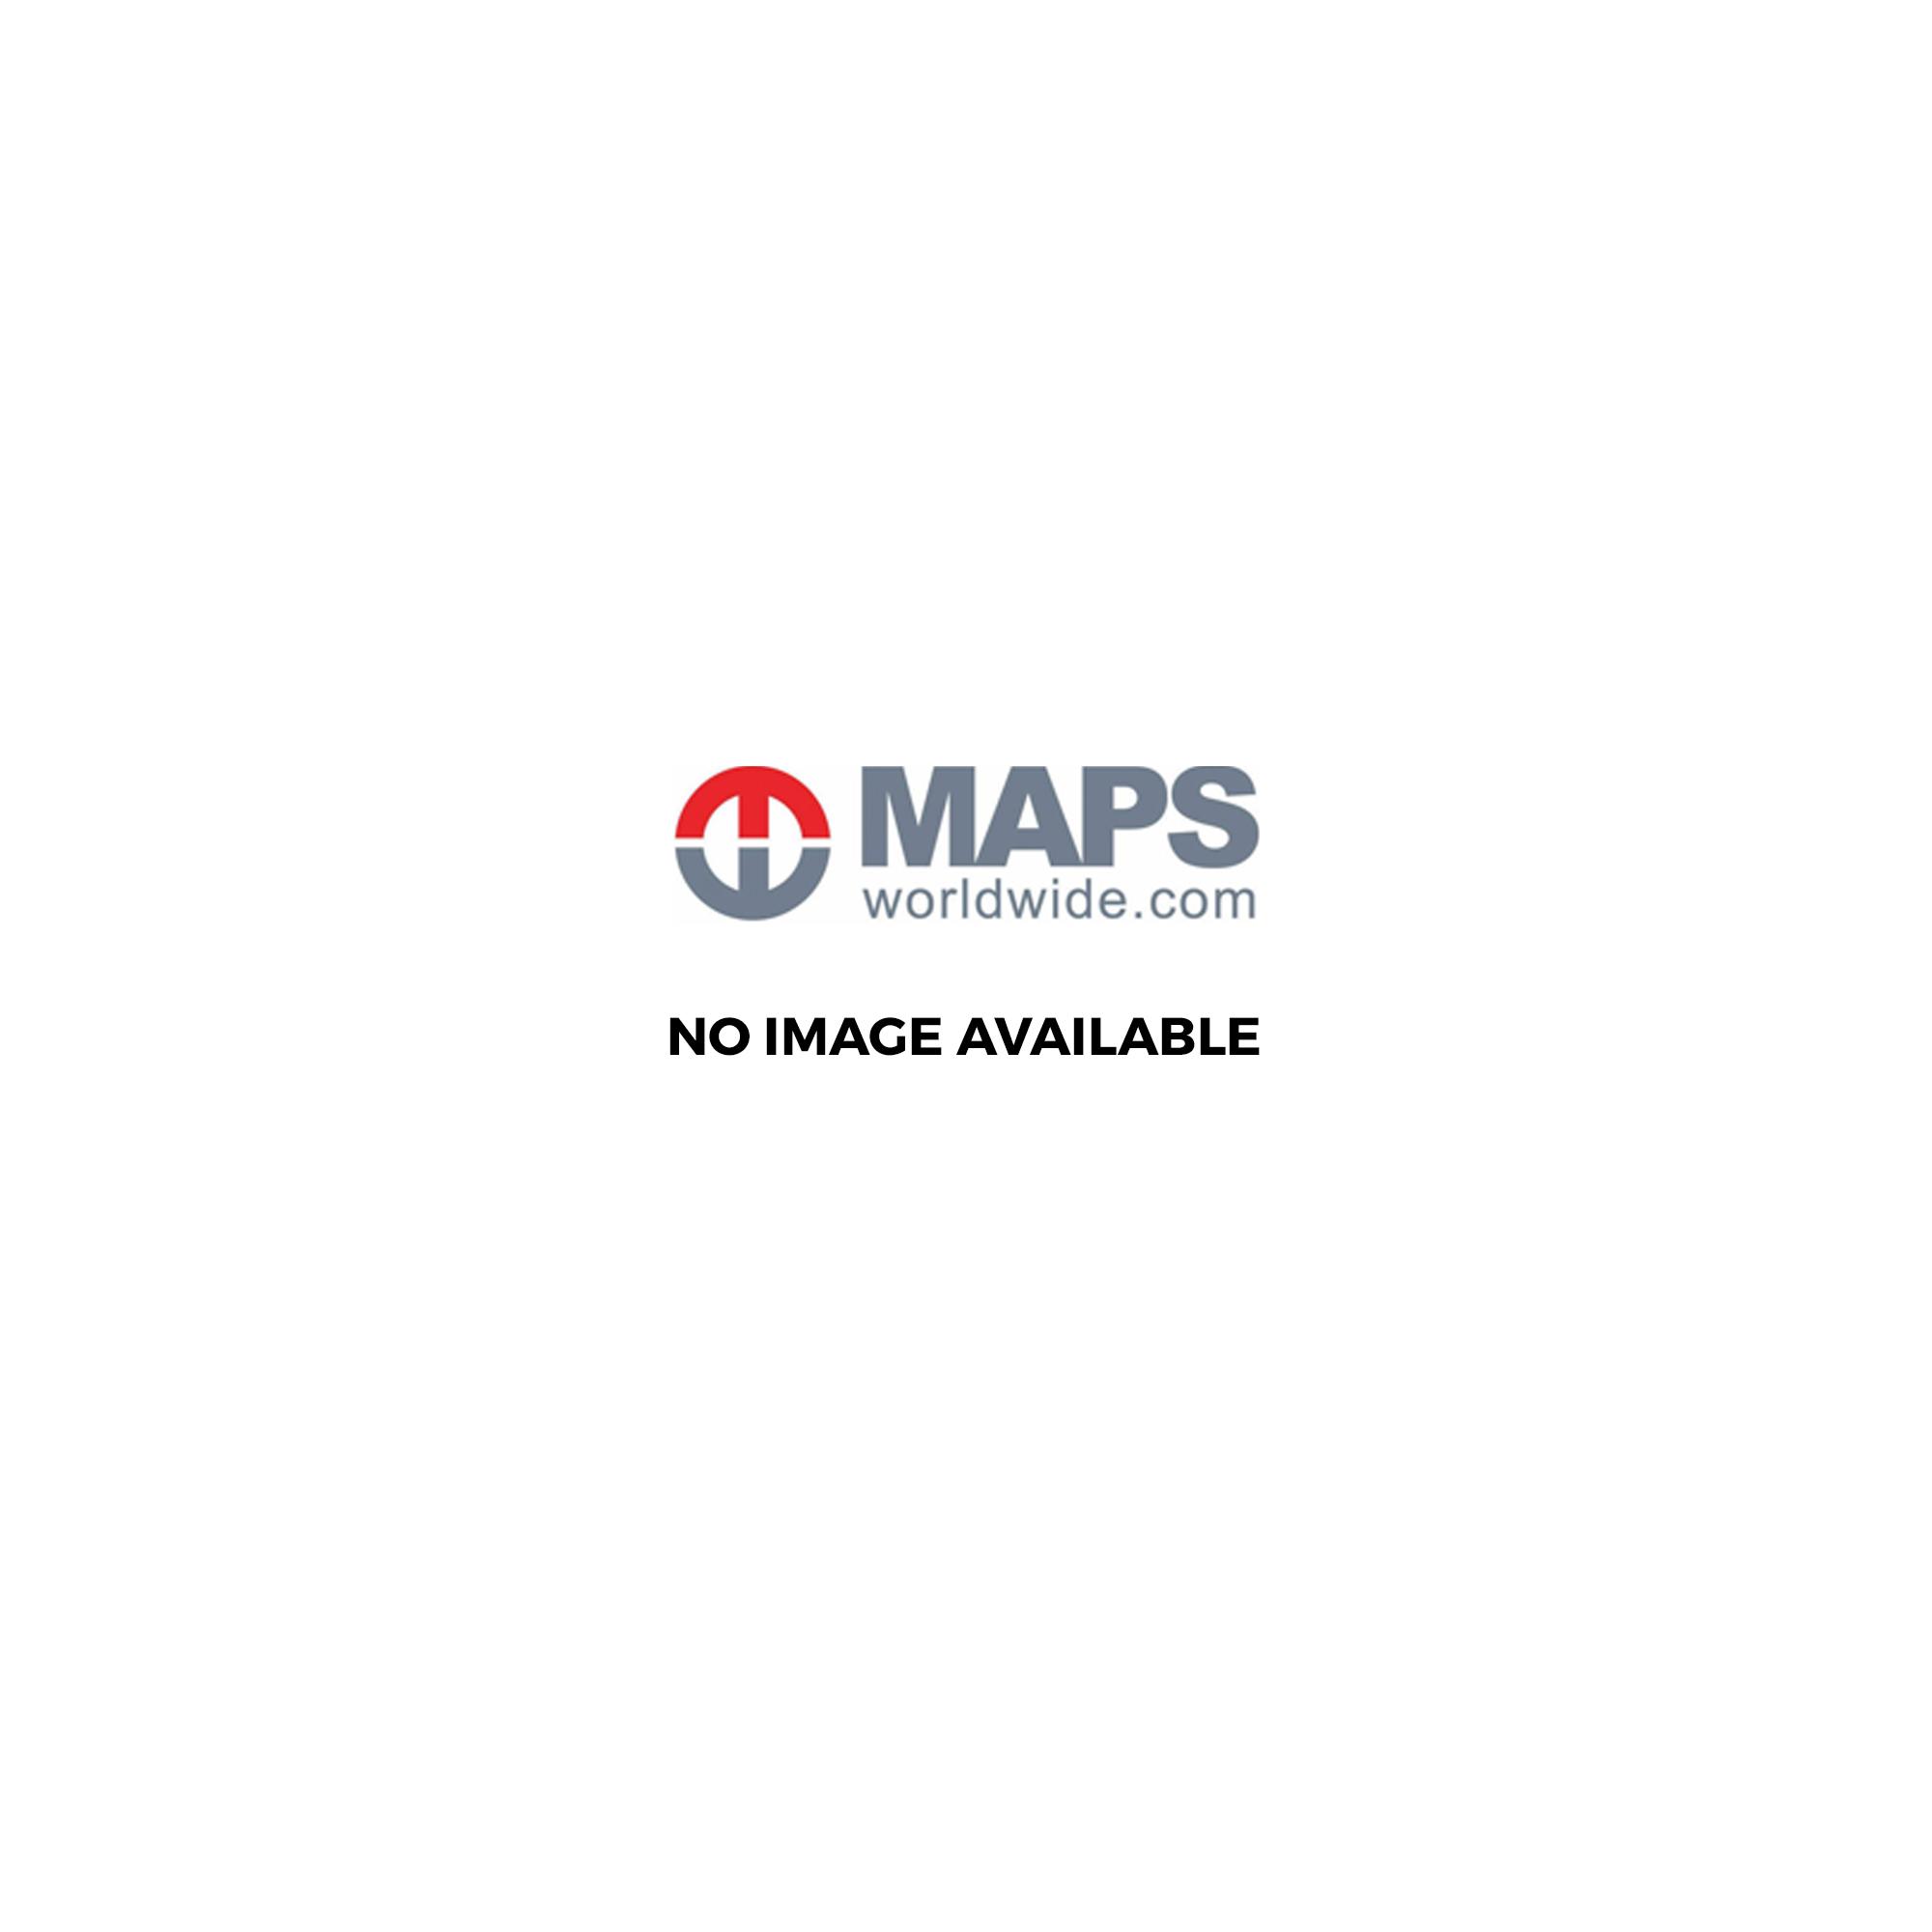 Kenya Road Map on kenya counties list, kenya thematic map, kenya animals, kenya flag, kenya points of interest, limuru kenya map, kenya route map, kenya vegetation map, kenya tourist map, kenya africa map, kenya topographical map, kenya police map, kenya travel map, kenya map regions, kenya equator, kenya map detailed, kenya coast map, kenya country map, kenya town map,